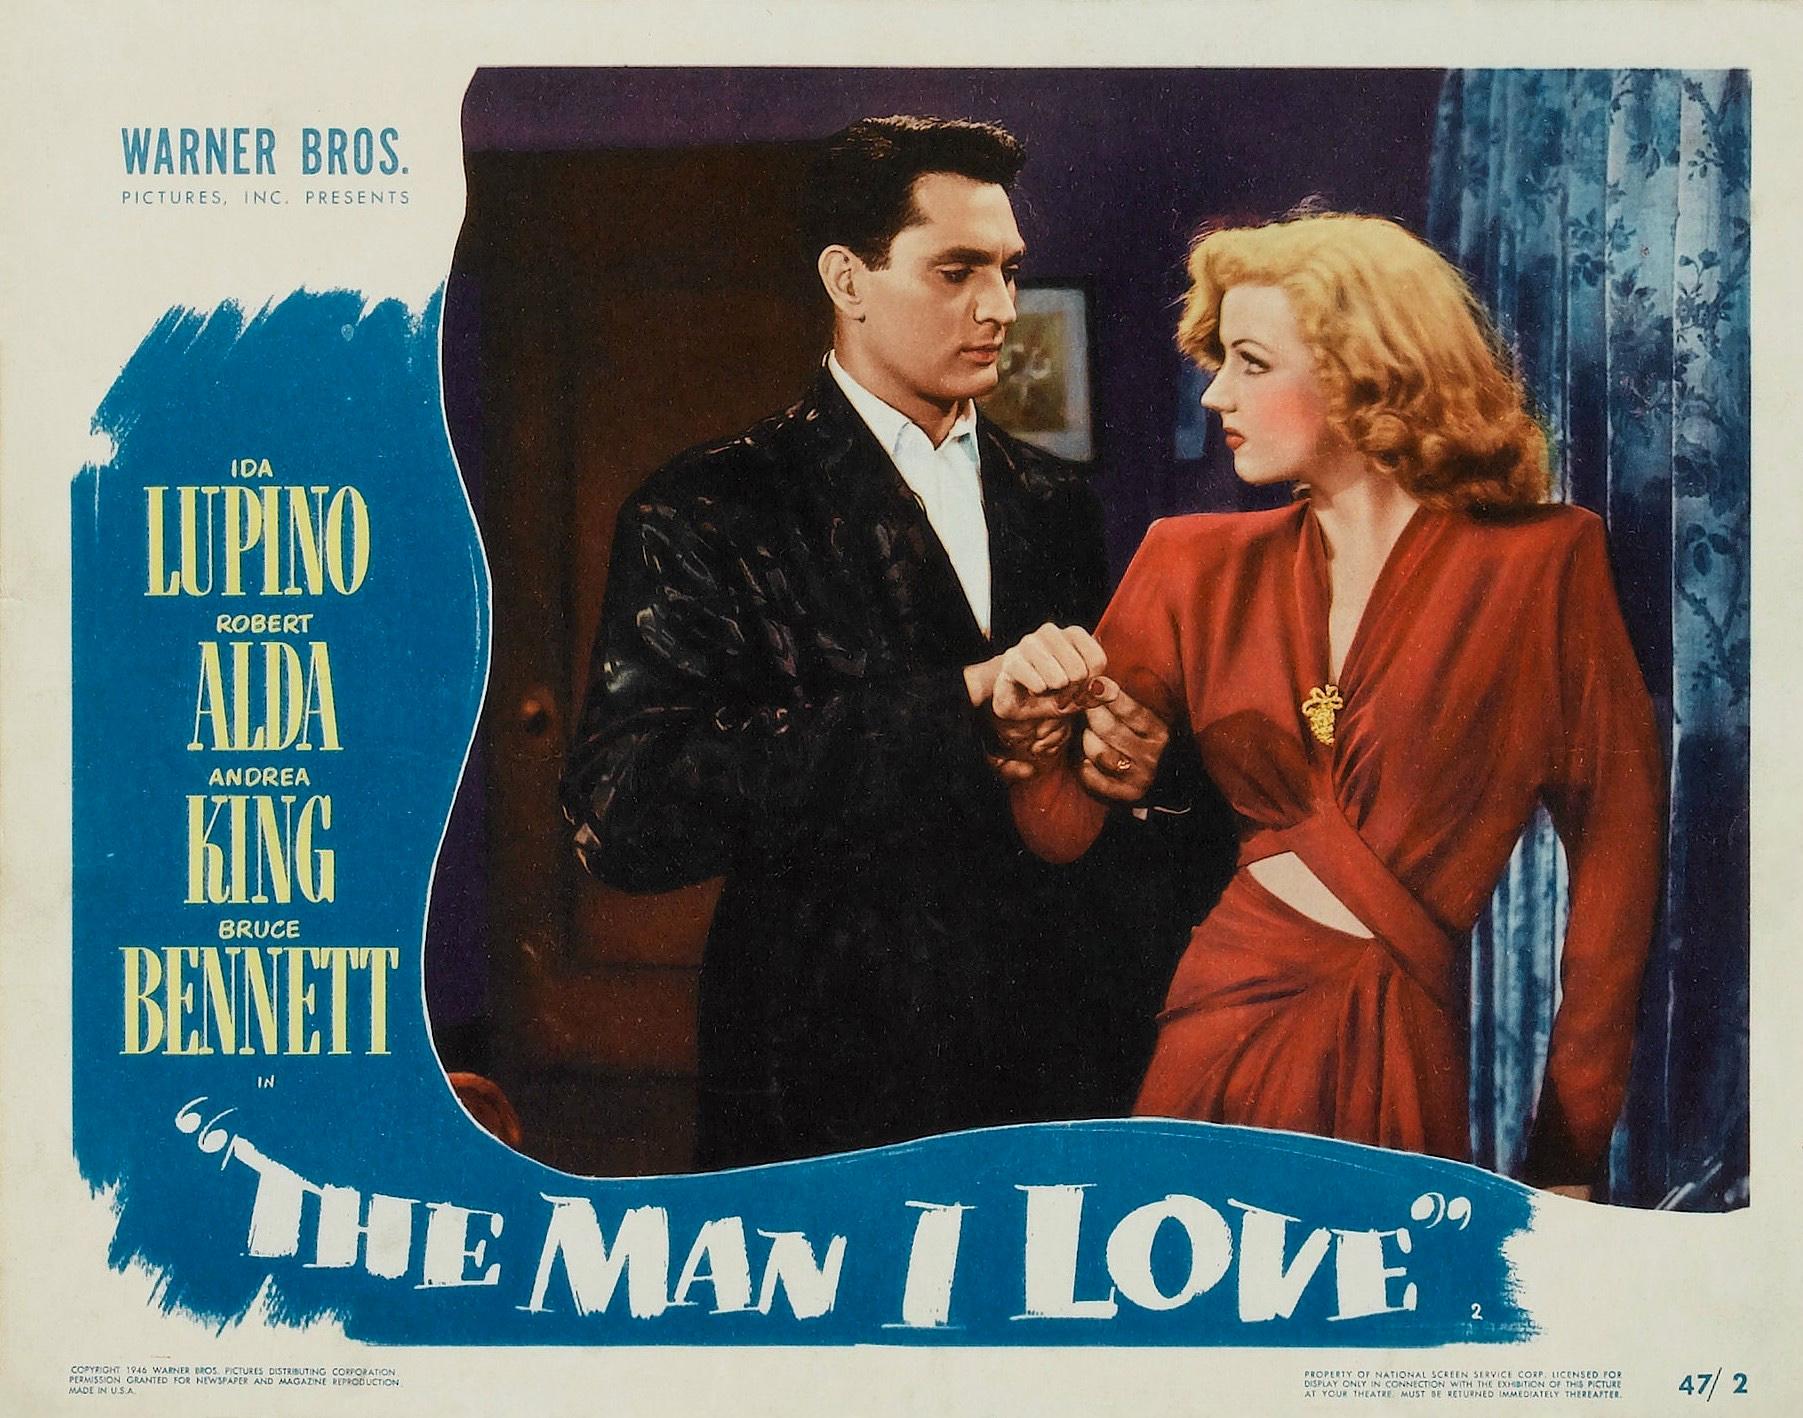 Robert Alda and Dolores Moran in The Man I Love (1946)